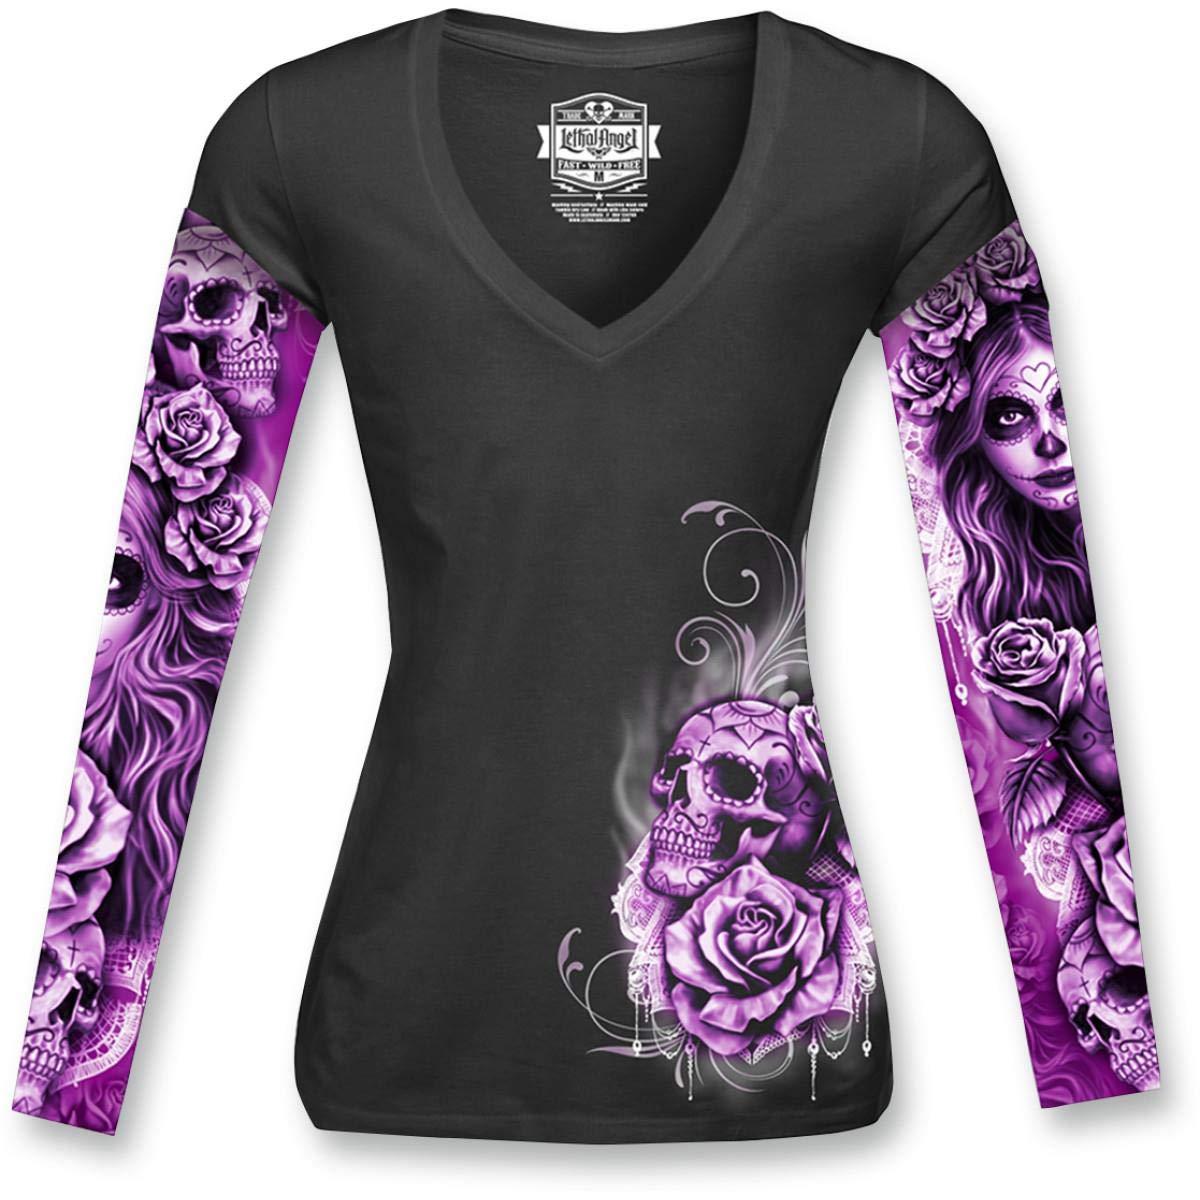 Lethal Threat Women's Long Sleeve Shirt (My Nightmare Tattoo Sleeve)(Black, X-Large), 1 Pack LT20428XL